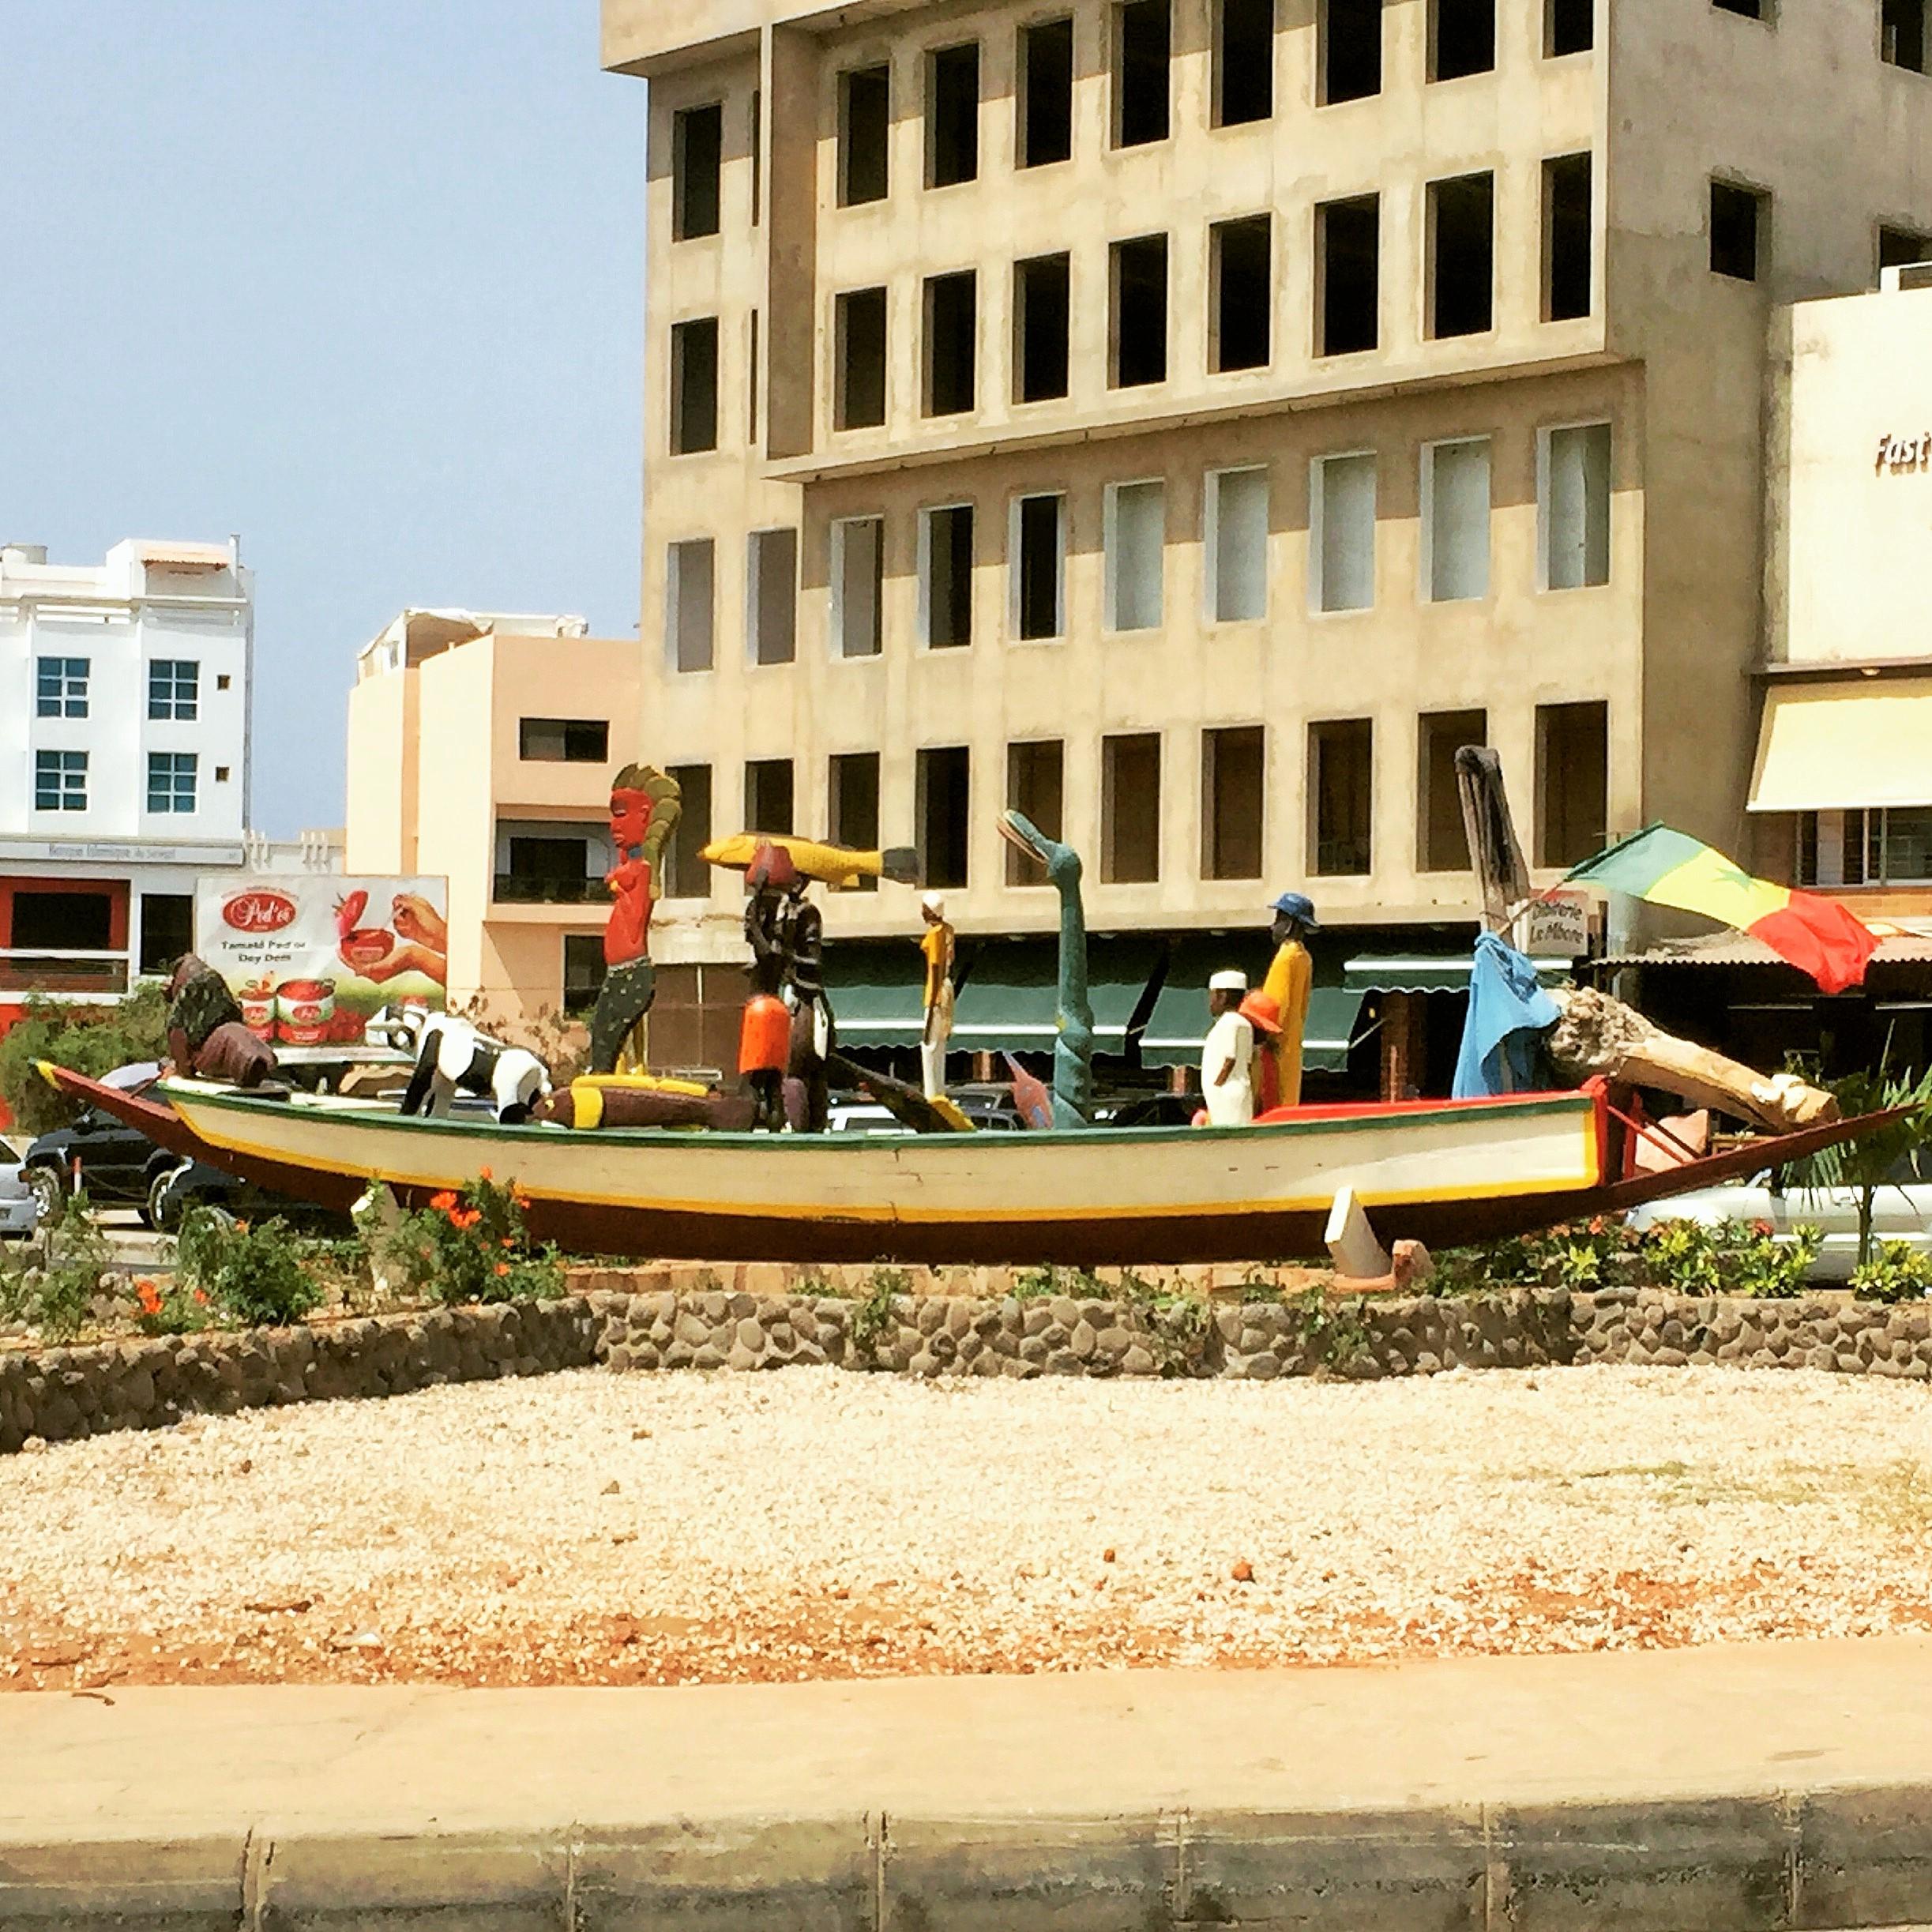 Street arts in Dakar